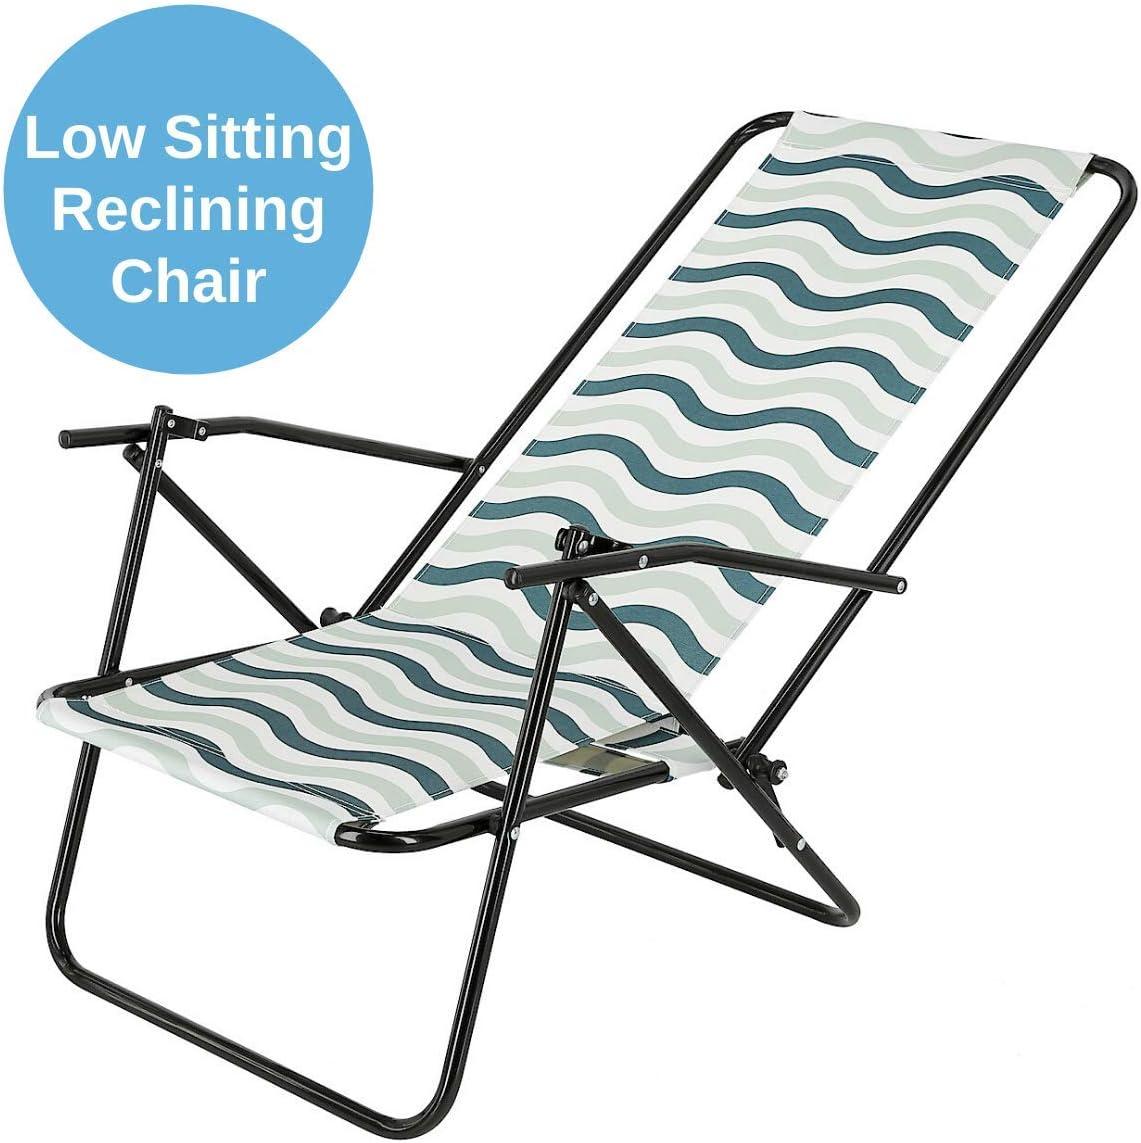 Clas Ohlson Deck Chair Foldable Beach Chair With Steel Frame Reclinable Garden Deck Chair Pink W Flowers Sunloungers Garden Outdoors